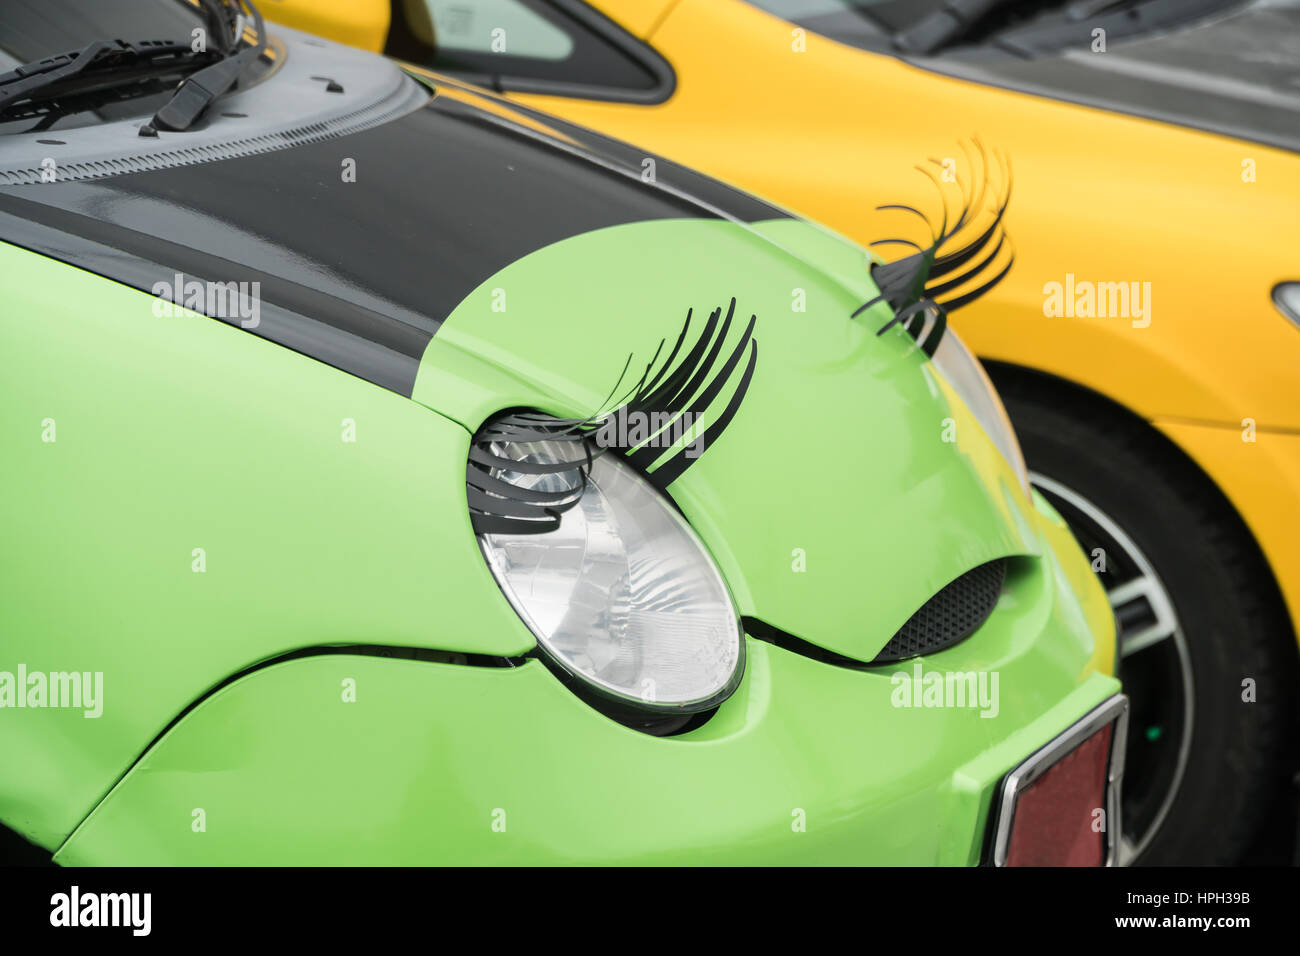 Eyelashes On Car Headlight Stock Photos Eyelashes On Car Headlight